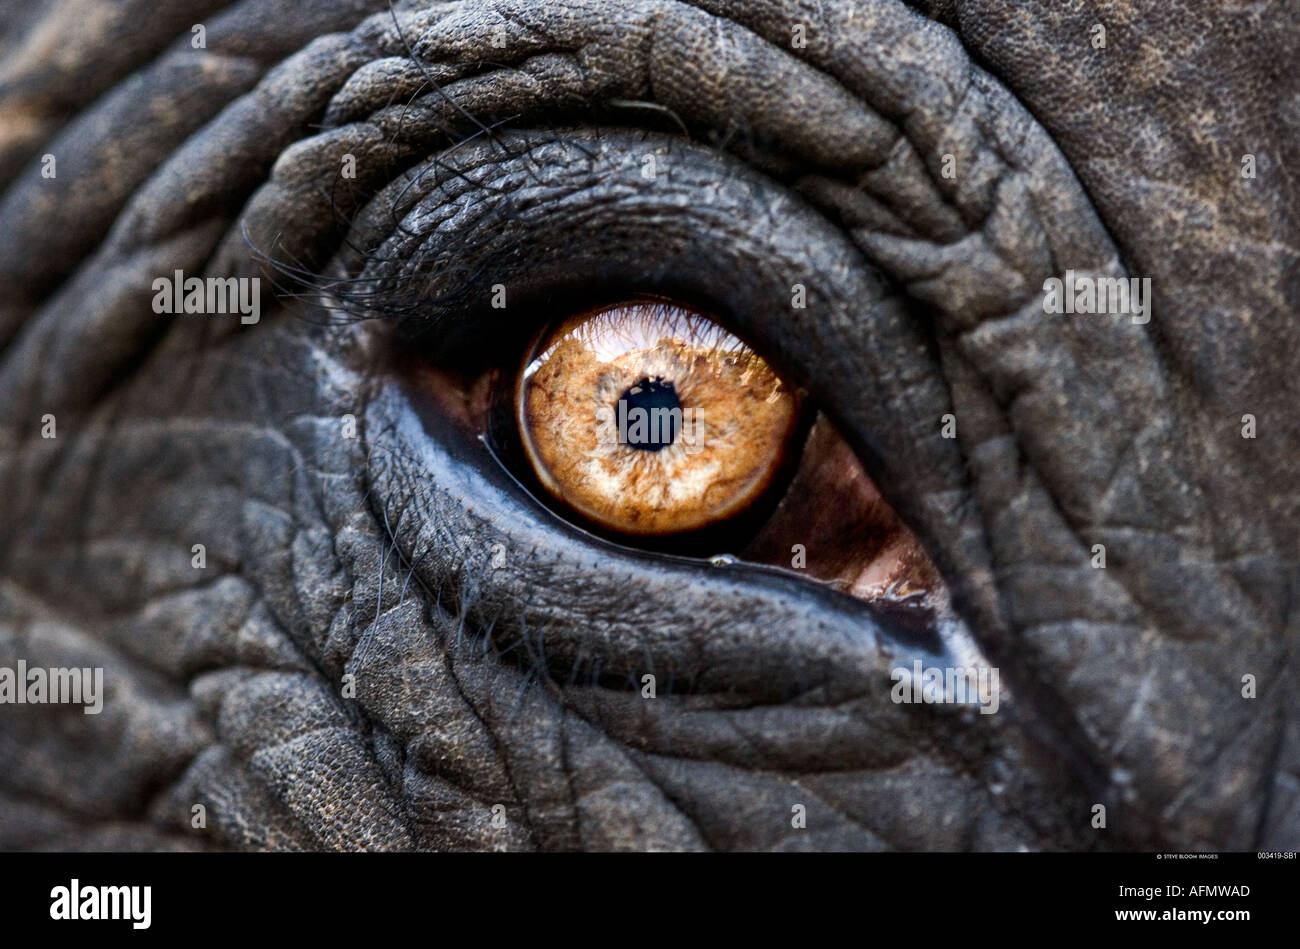 Cerca del ojo de un elefante indio India Jaipur Imagen De Stock